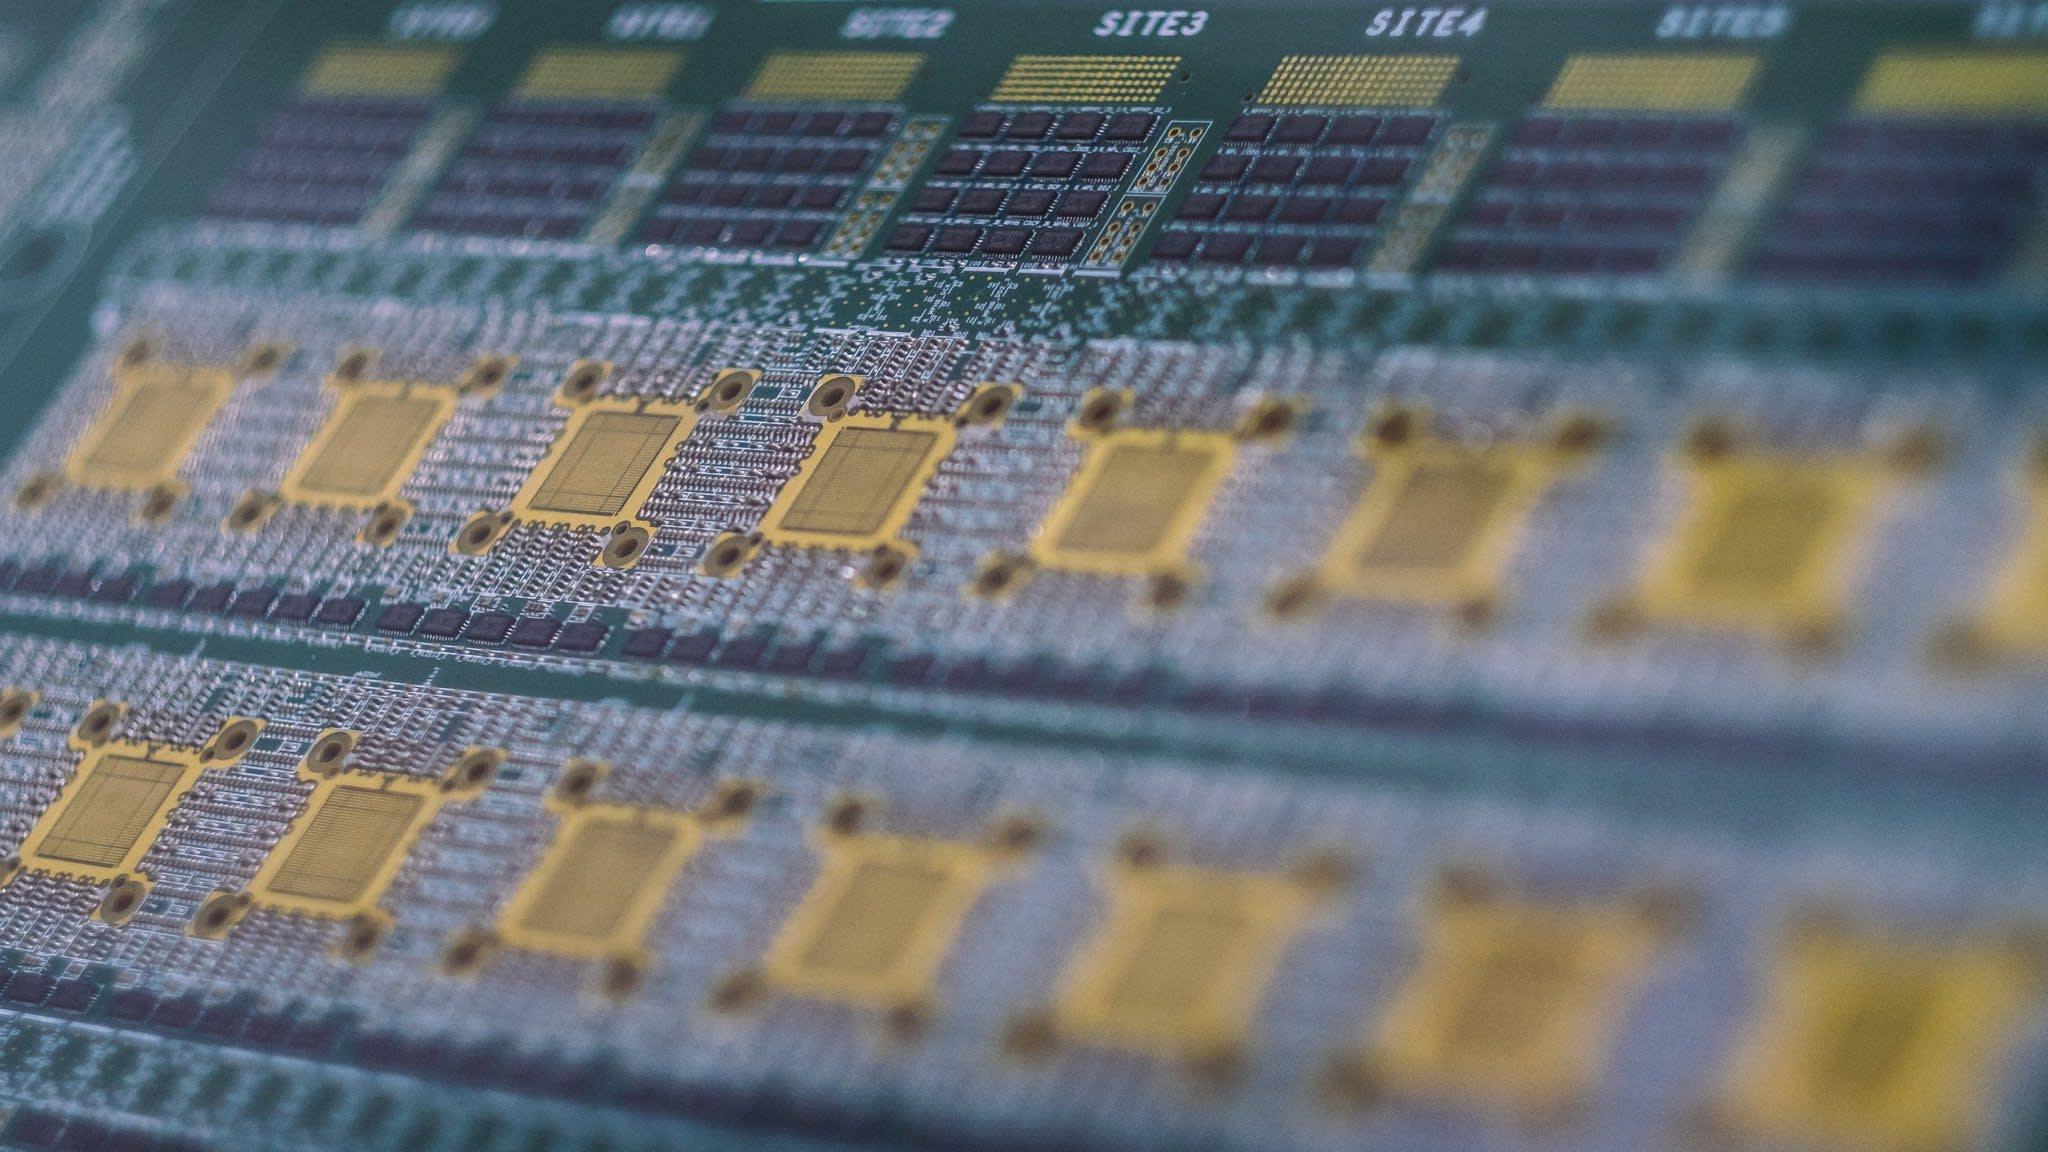 Trade war casts shadow over tech manufacturers